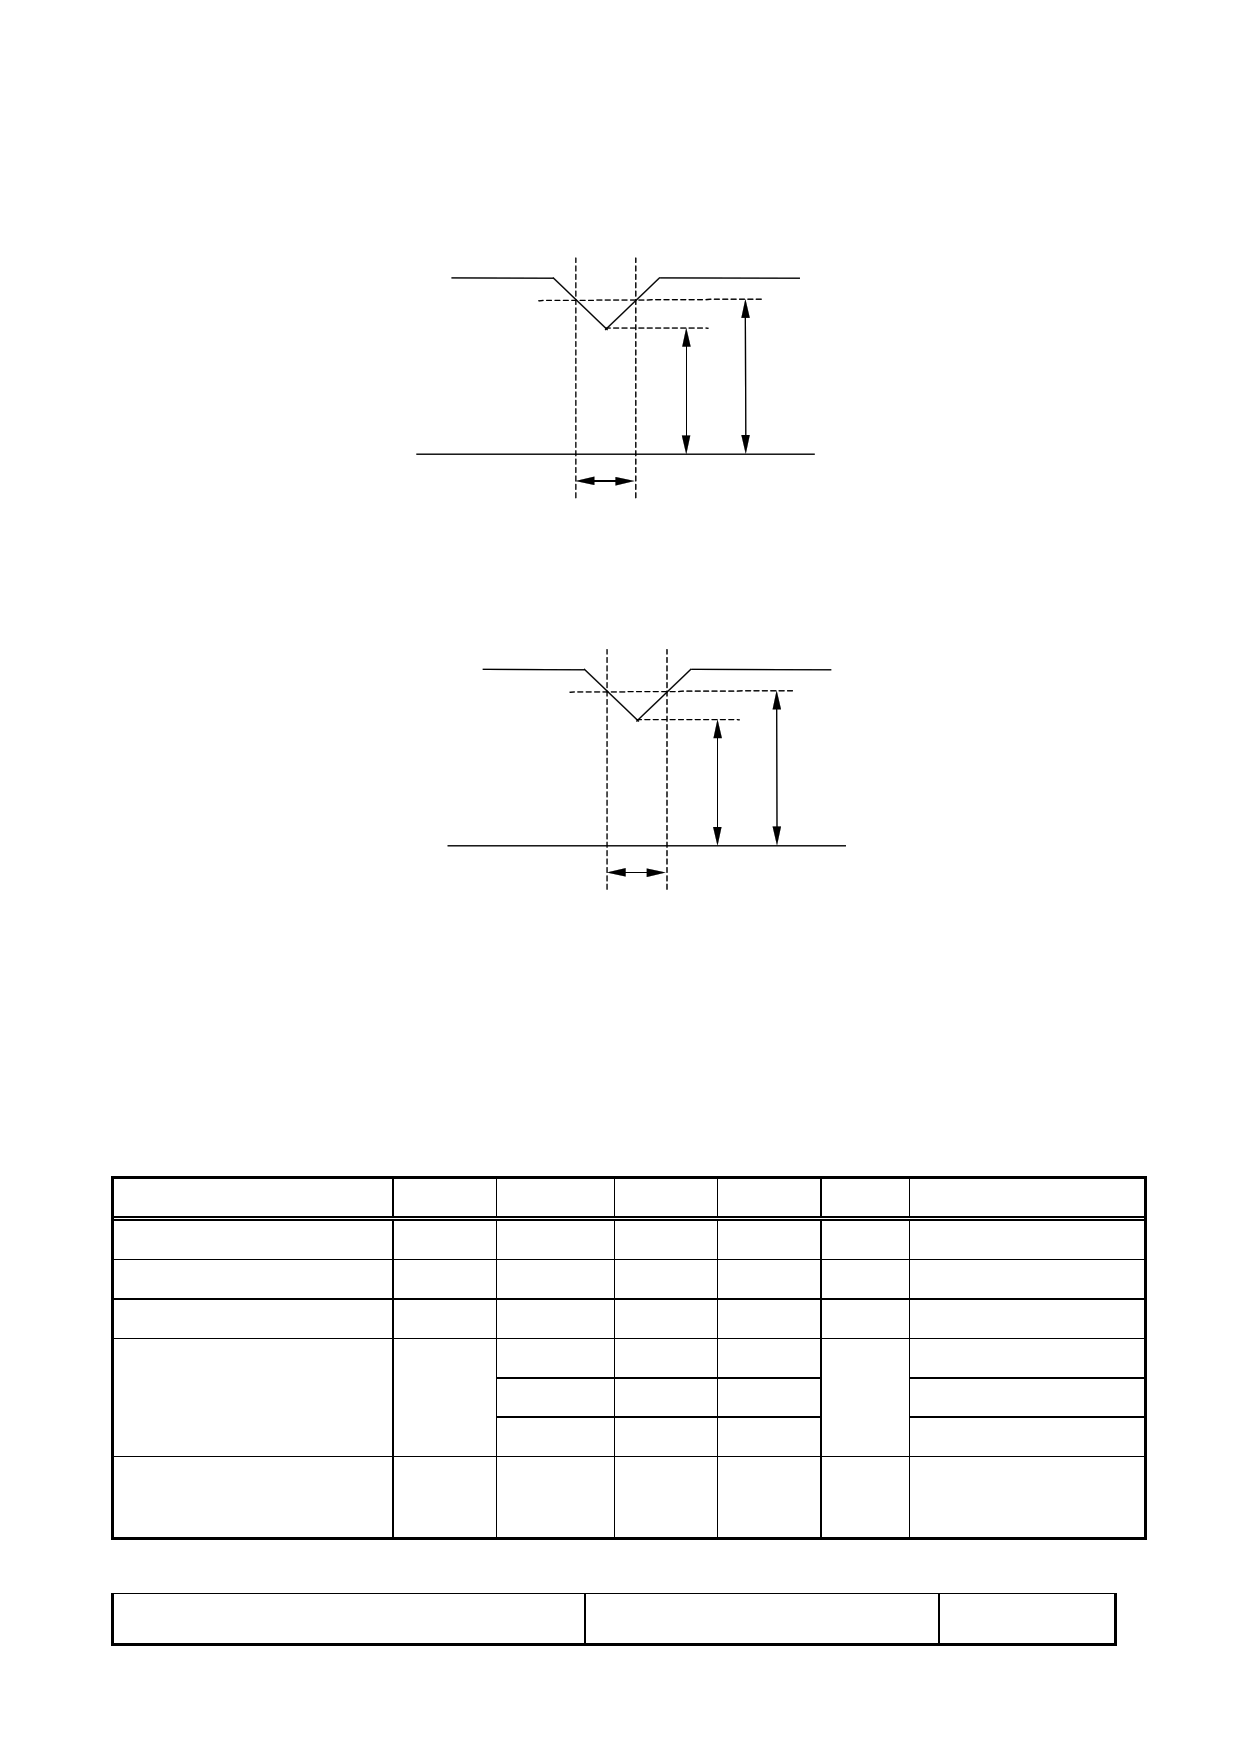 T-51512D121J-FE-A-AC pdf